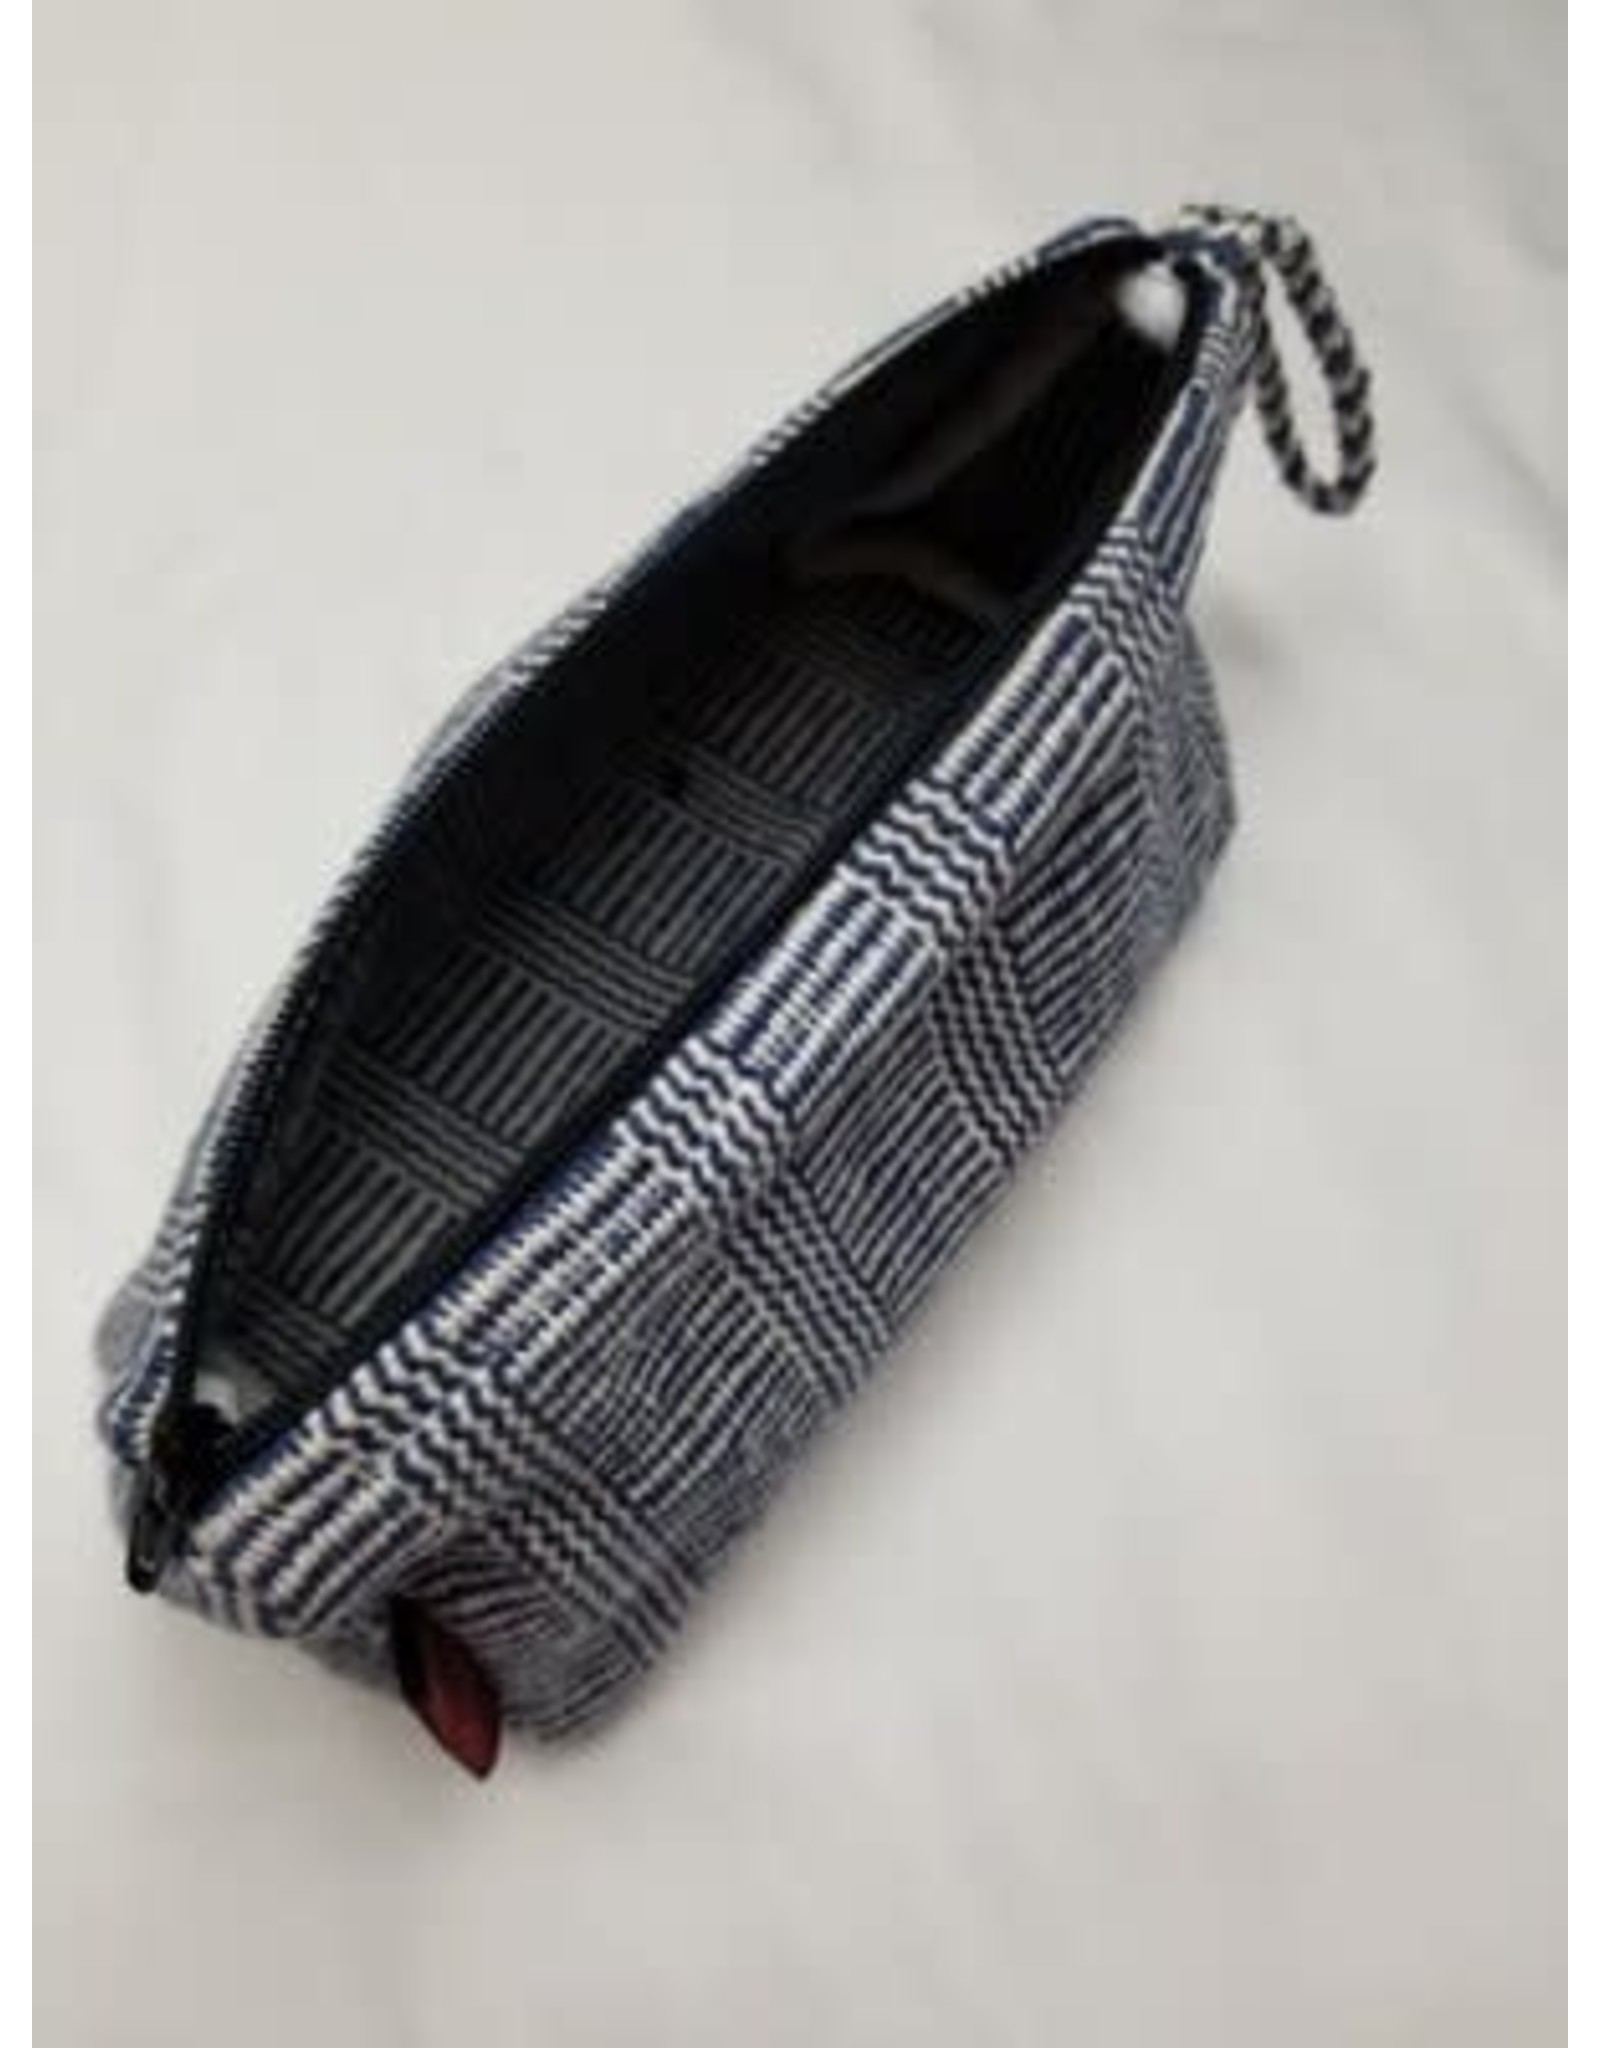 Prism Cosmetic Bag, Braided Handle, Nepal